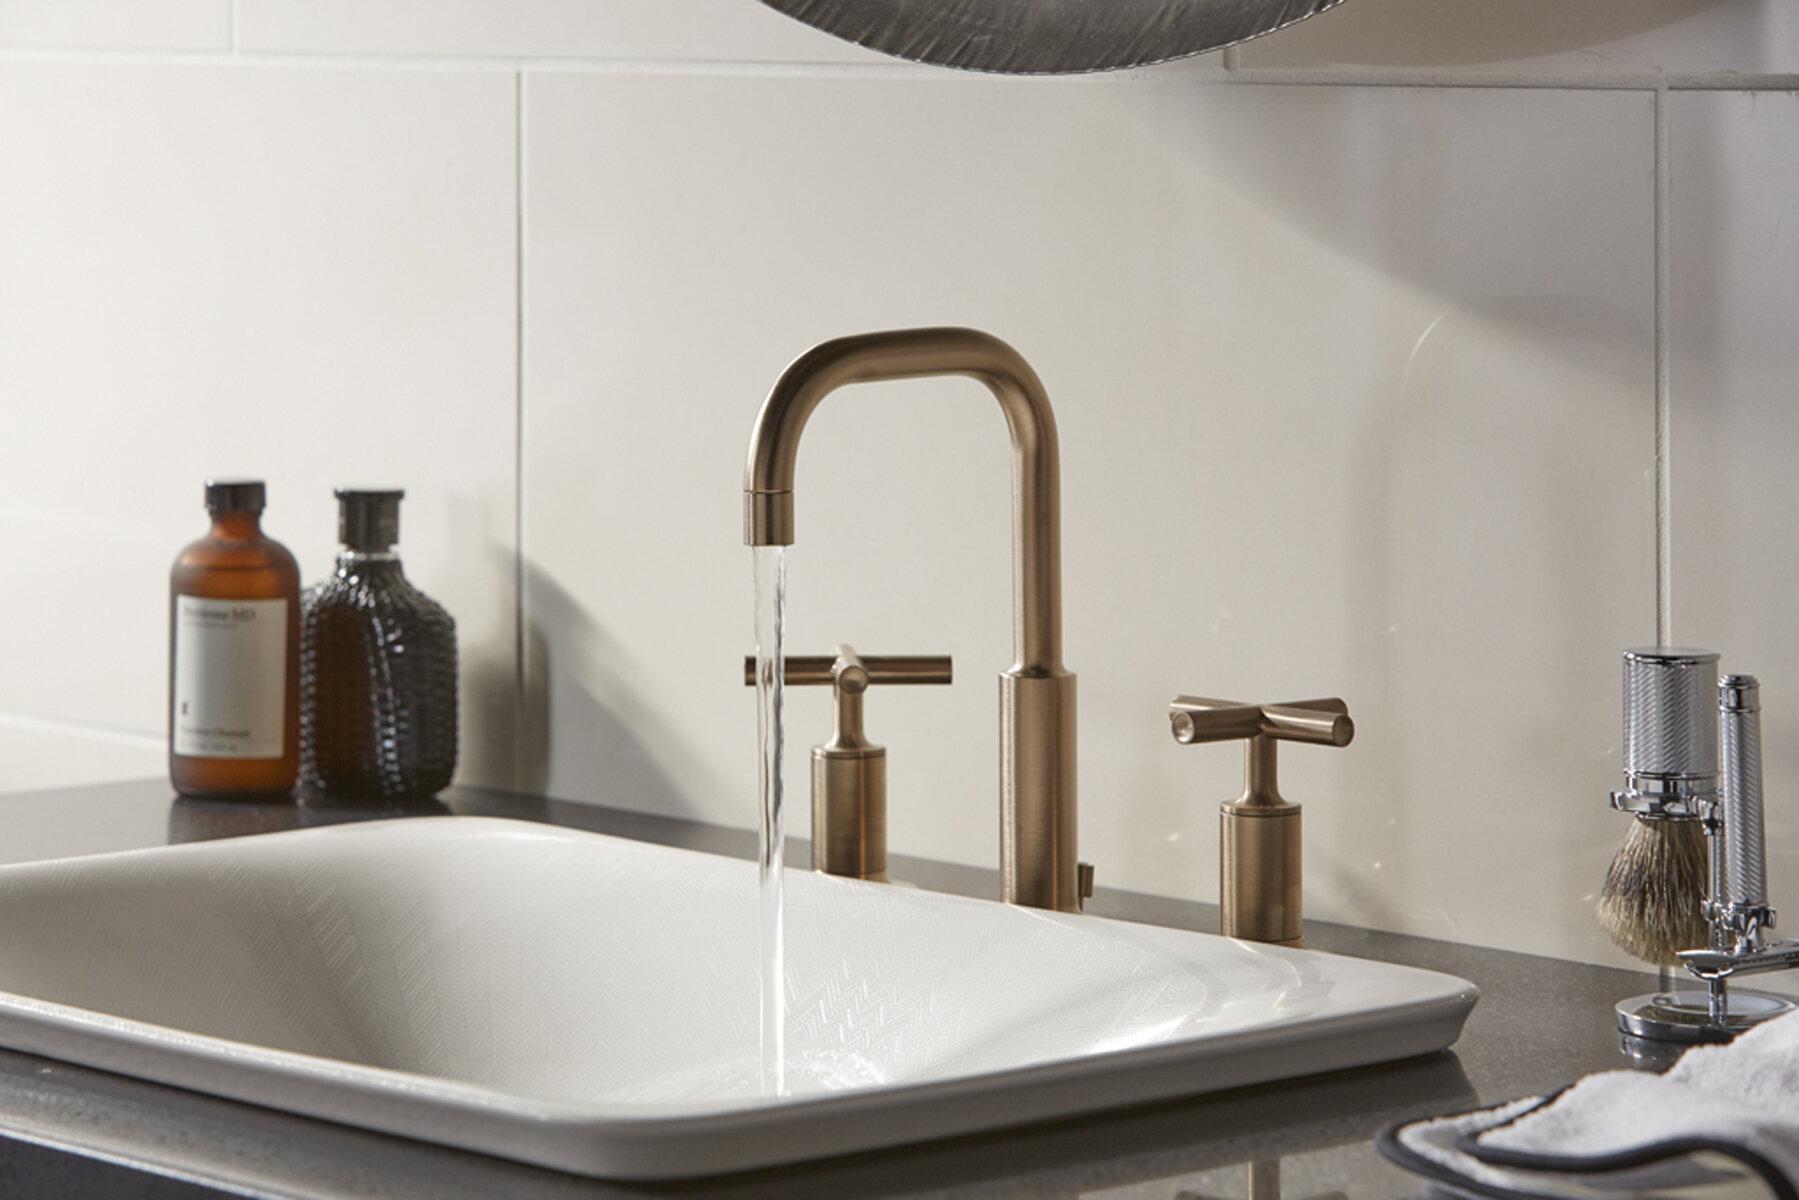 K 75749 Hd1 0 Kohler Sartorial Vitreous China Rectangular Vessel Bathroom Sink Wayfair